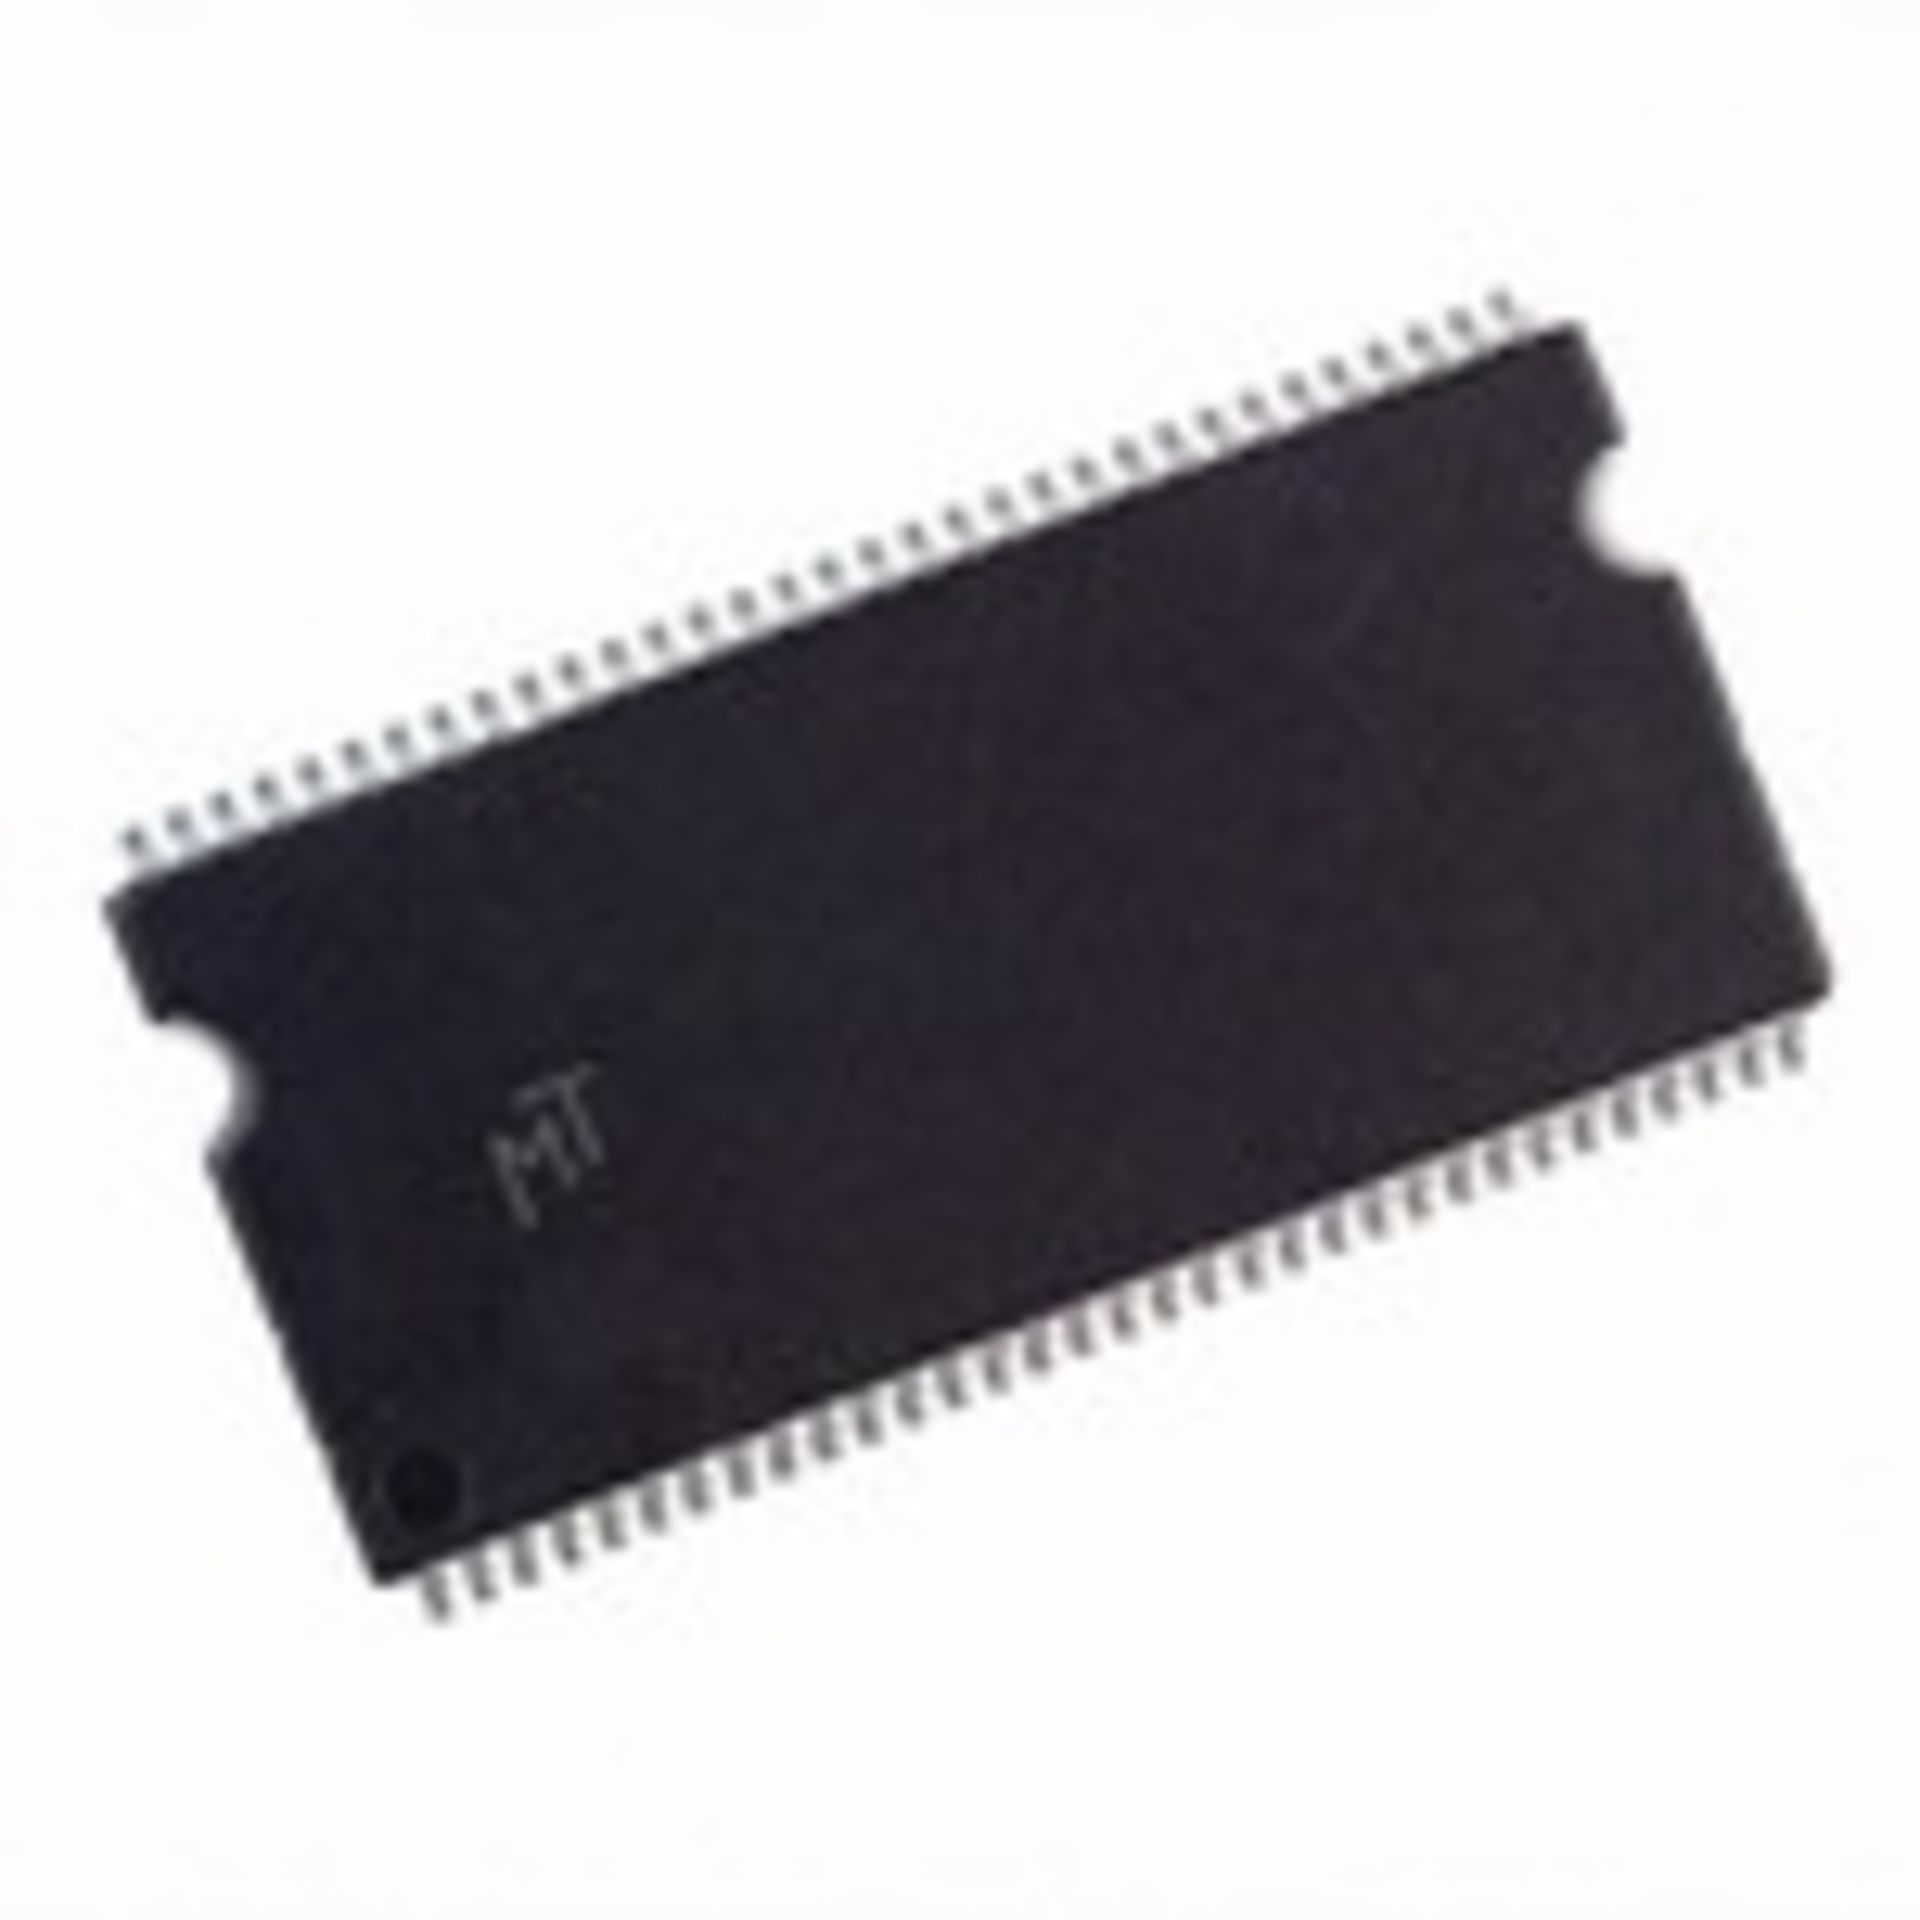 Micron Technology MT46V64M8TG-6T IT:F DRAM Chip, DDR SDRAM 512Mbit 64Mx8 2.5V 66-Pin TSOP Tray,